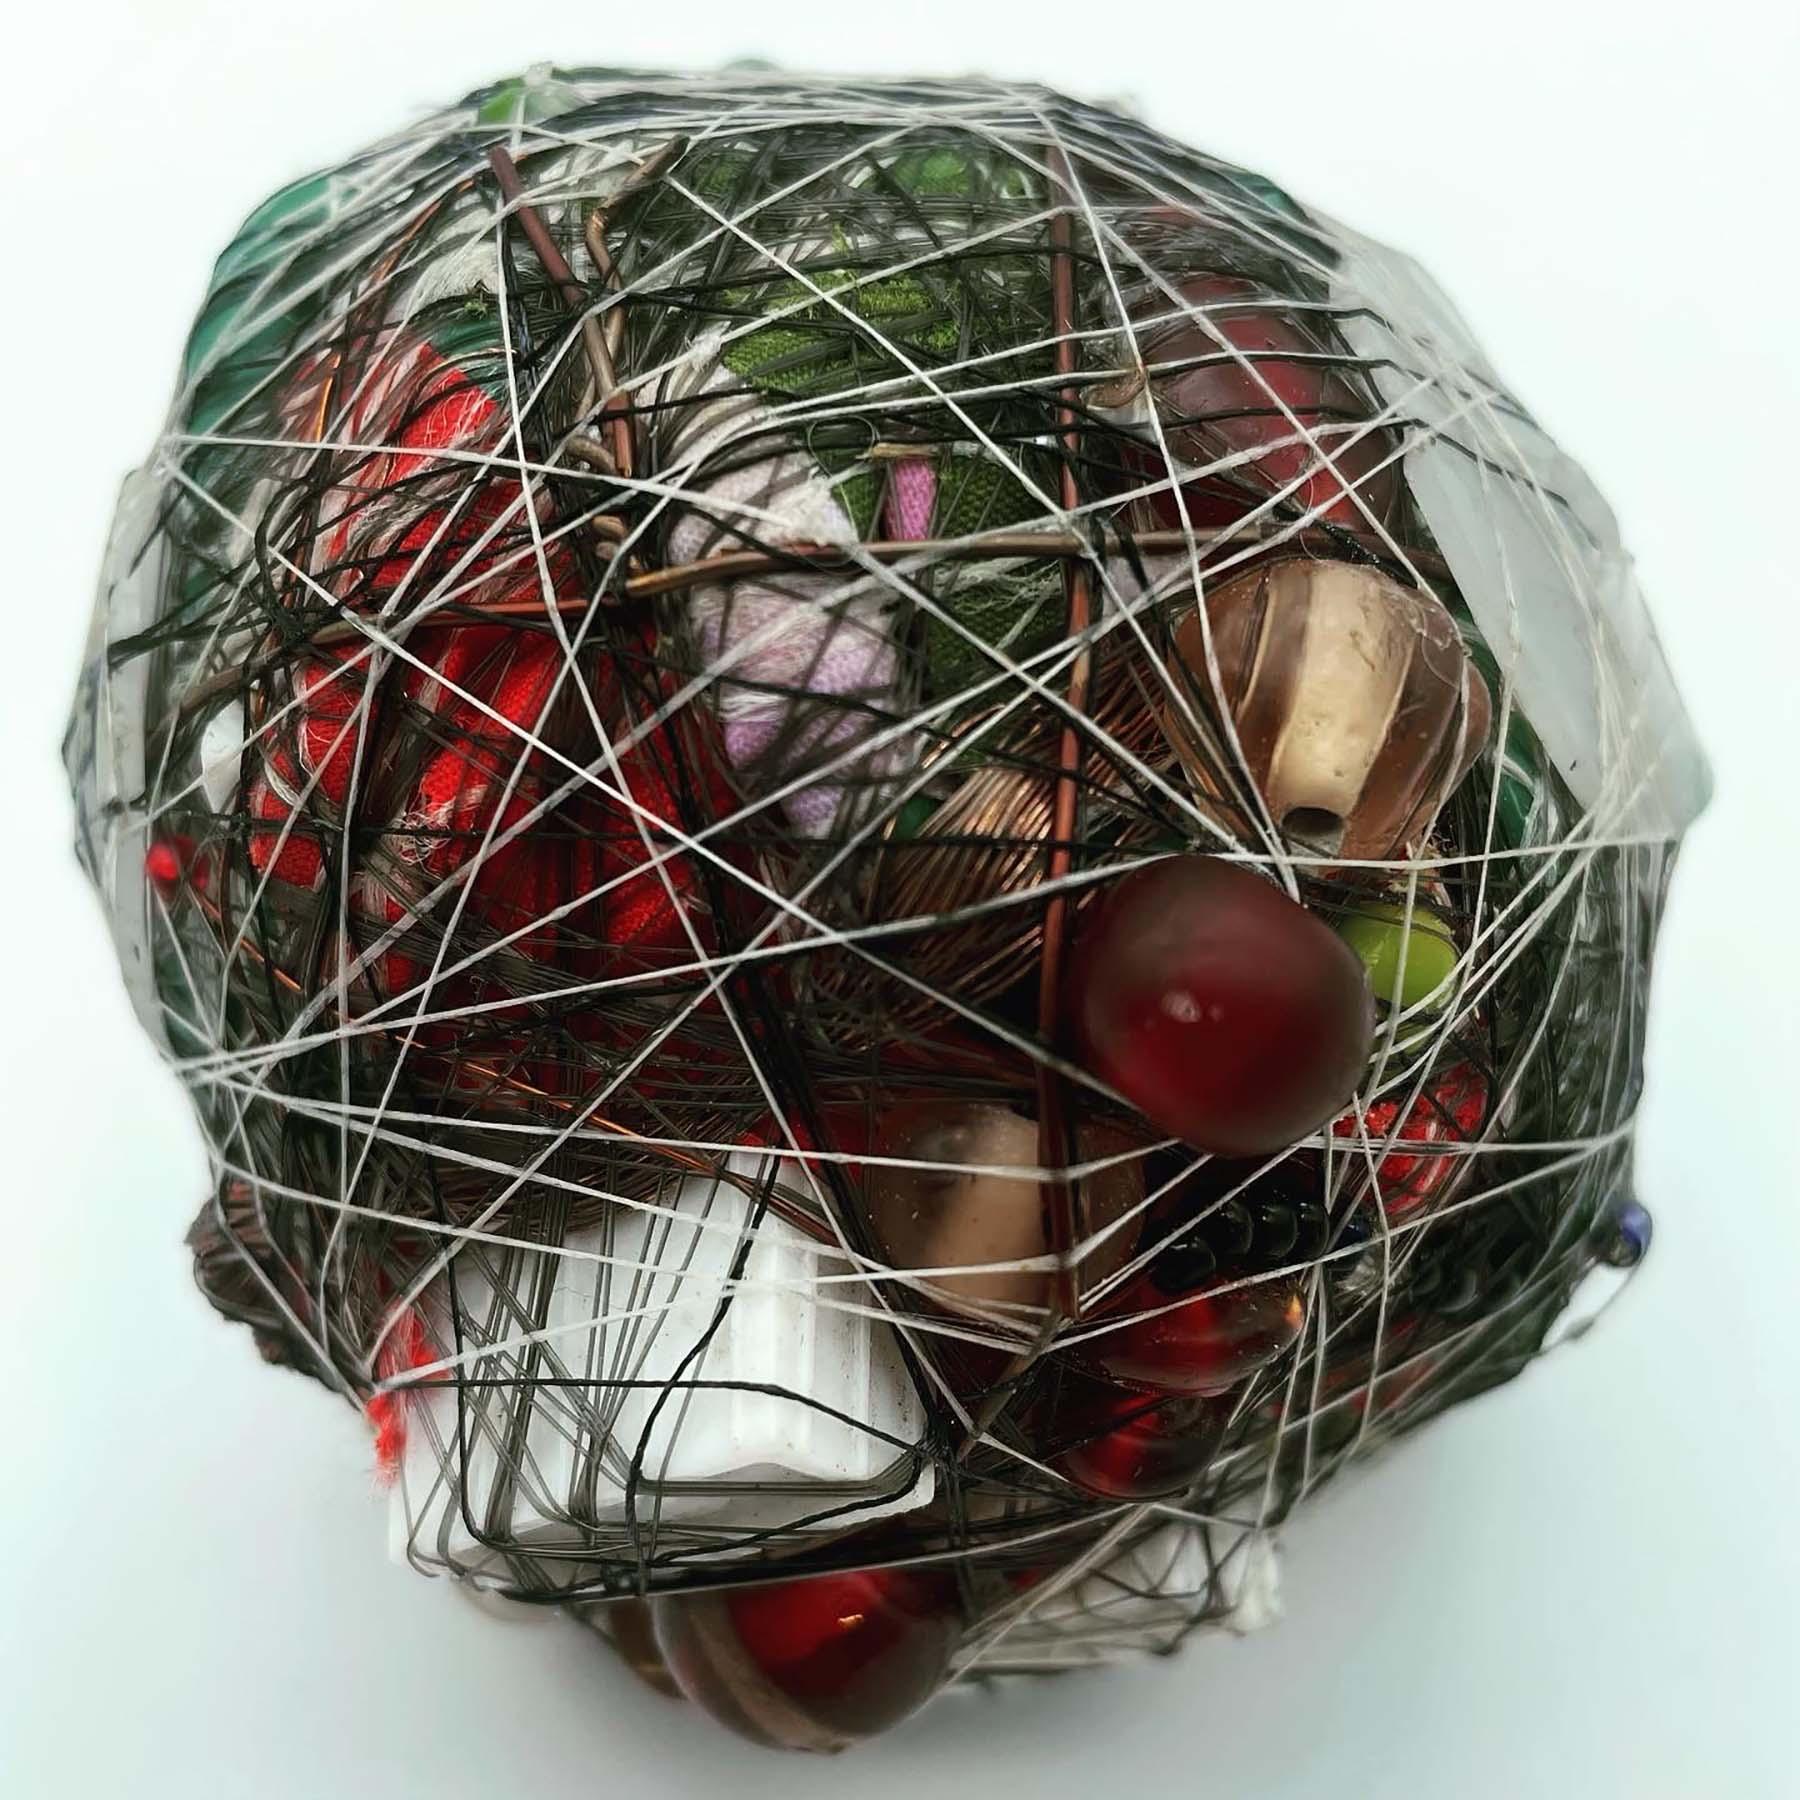 raw materials, , junk balls, vinyl toys, beach, frank kozik, old, outsider art, recycled, wrapped art